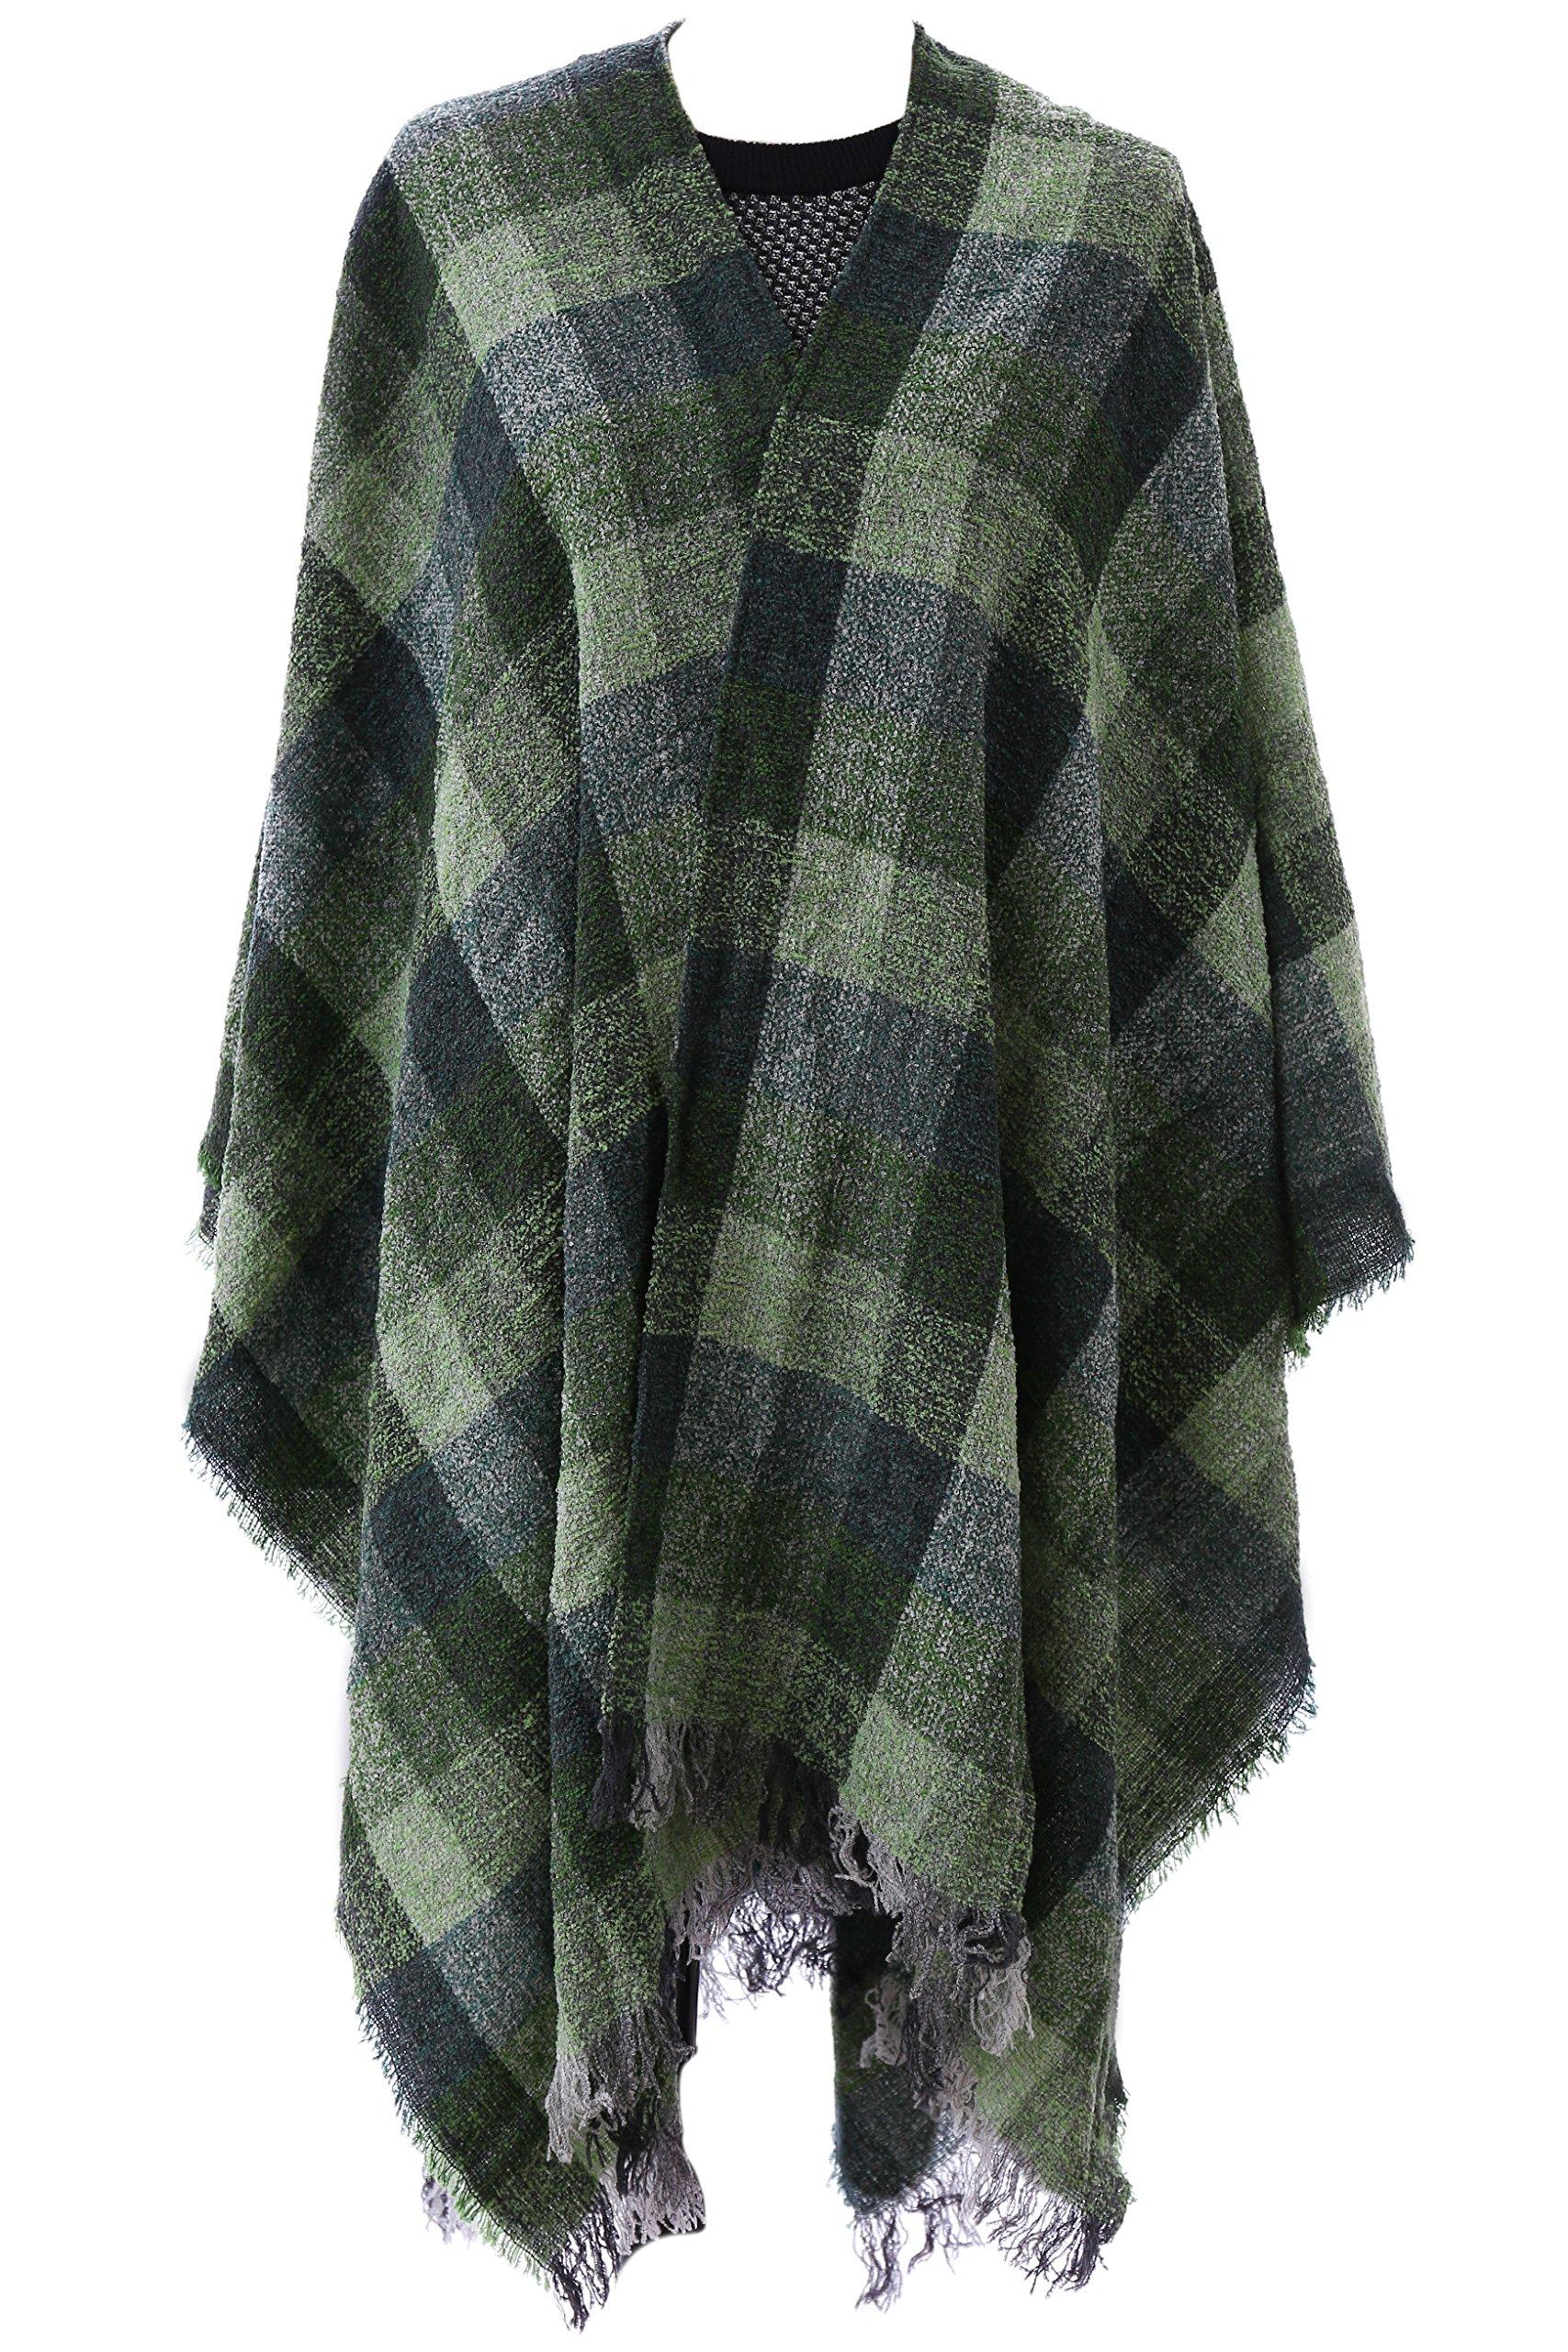 "Biddy Murphy Ruana Wool Checkered Green 54"" x 72"" Made in Ireland"